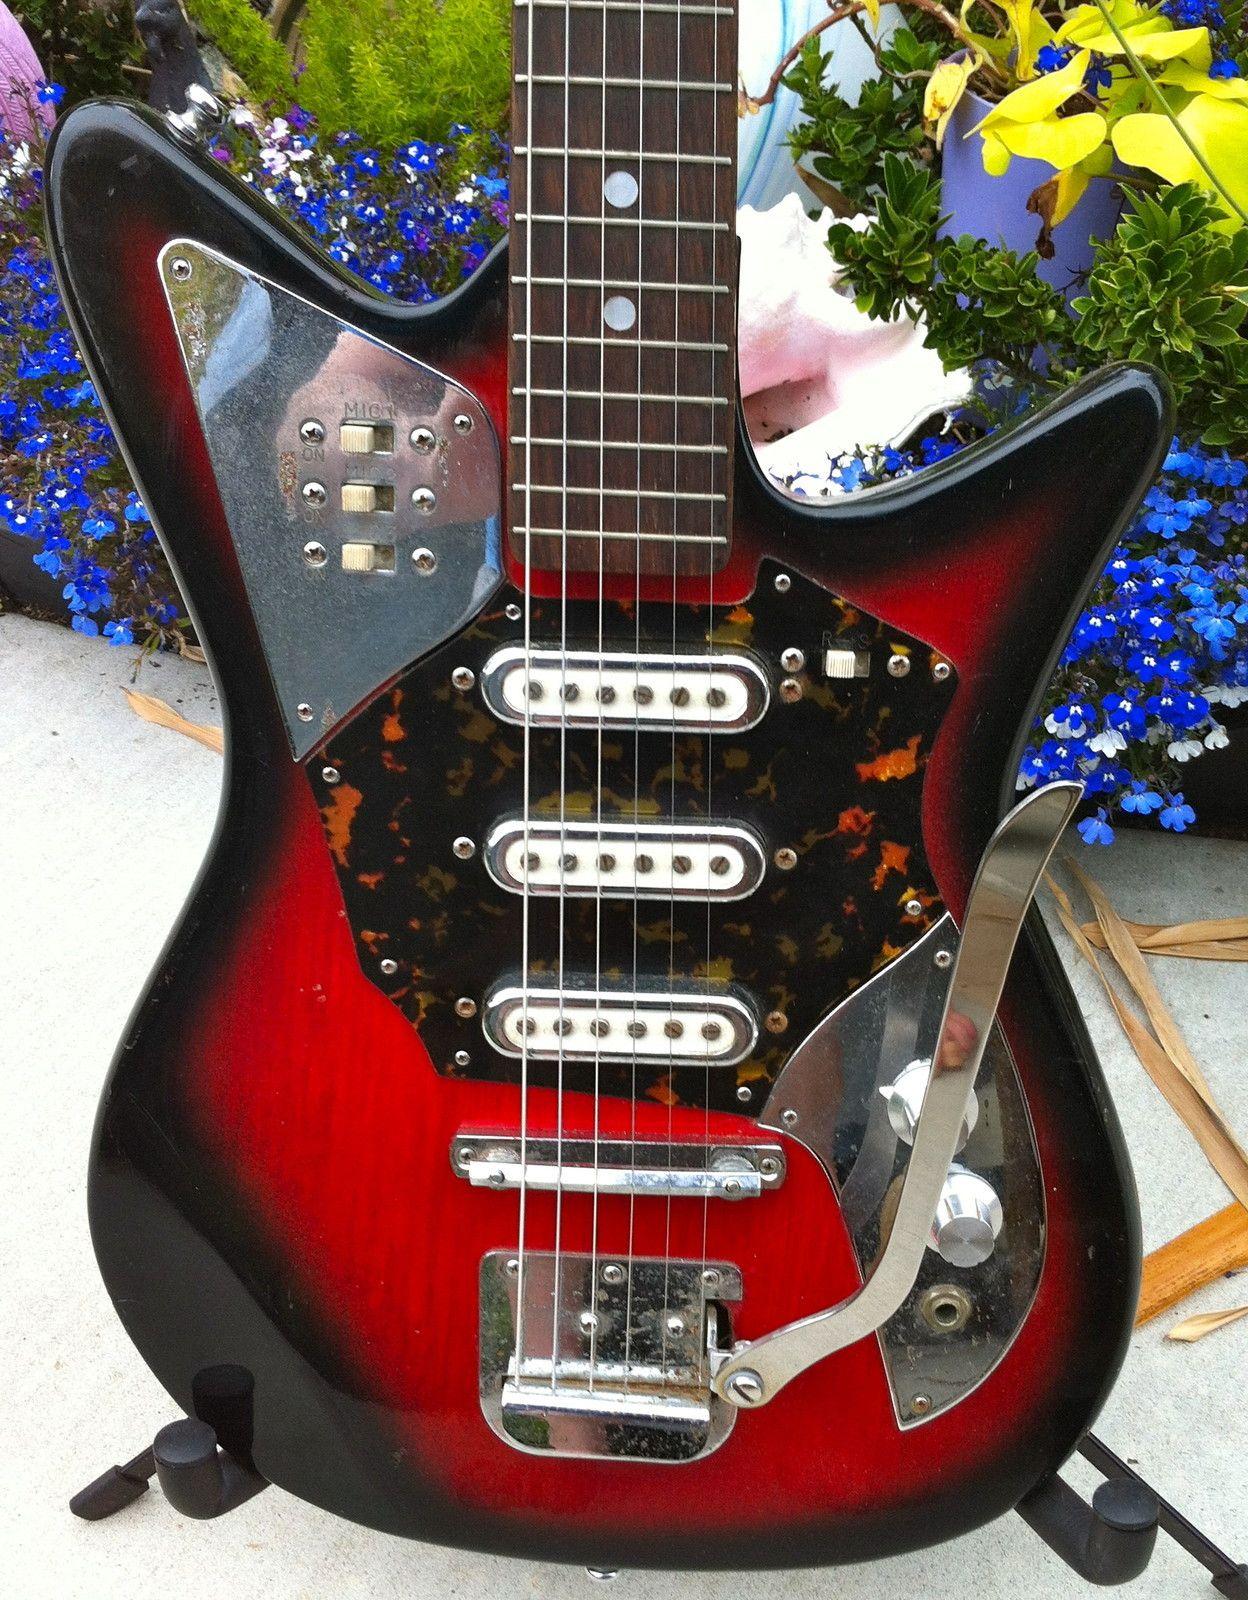 Ultra RARE Vintage 60's St George RedBurst Guitar